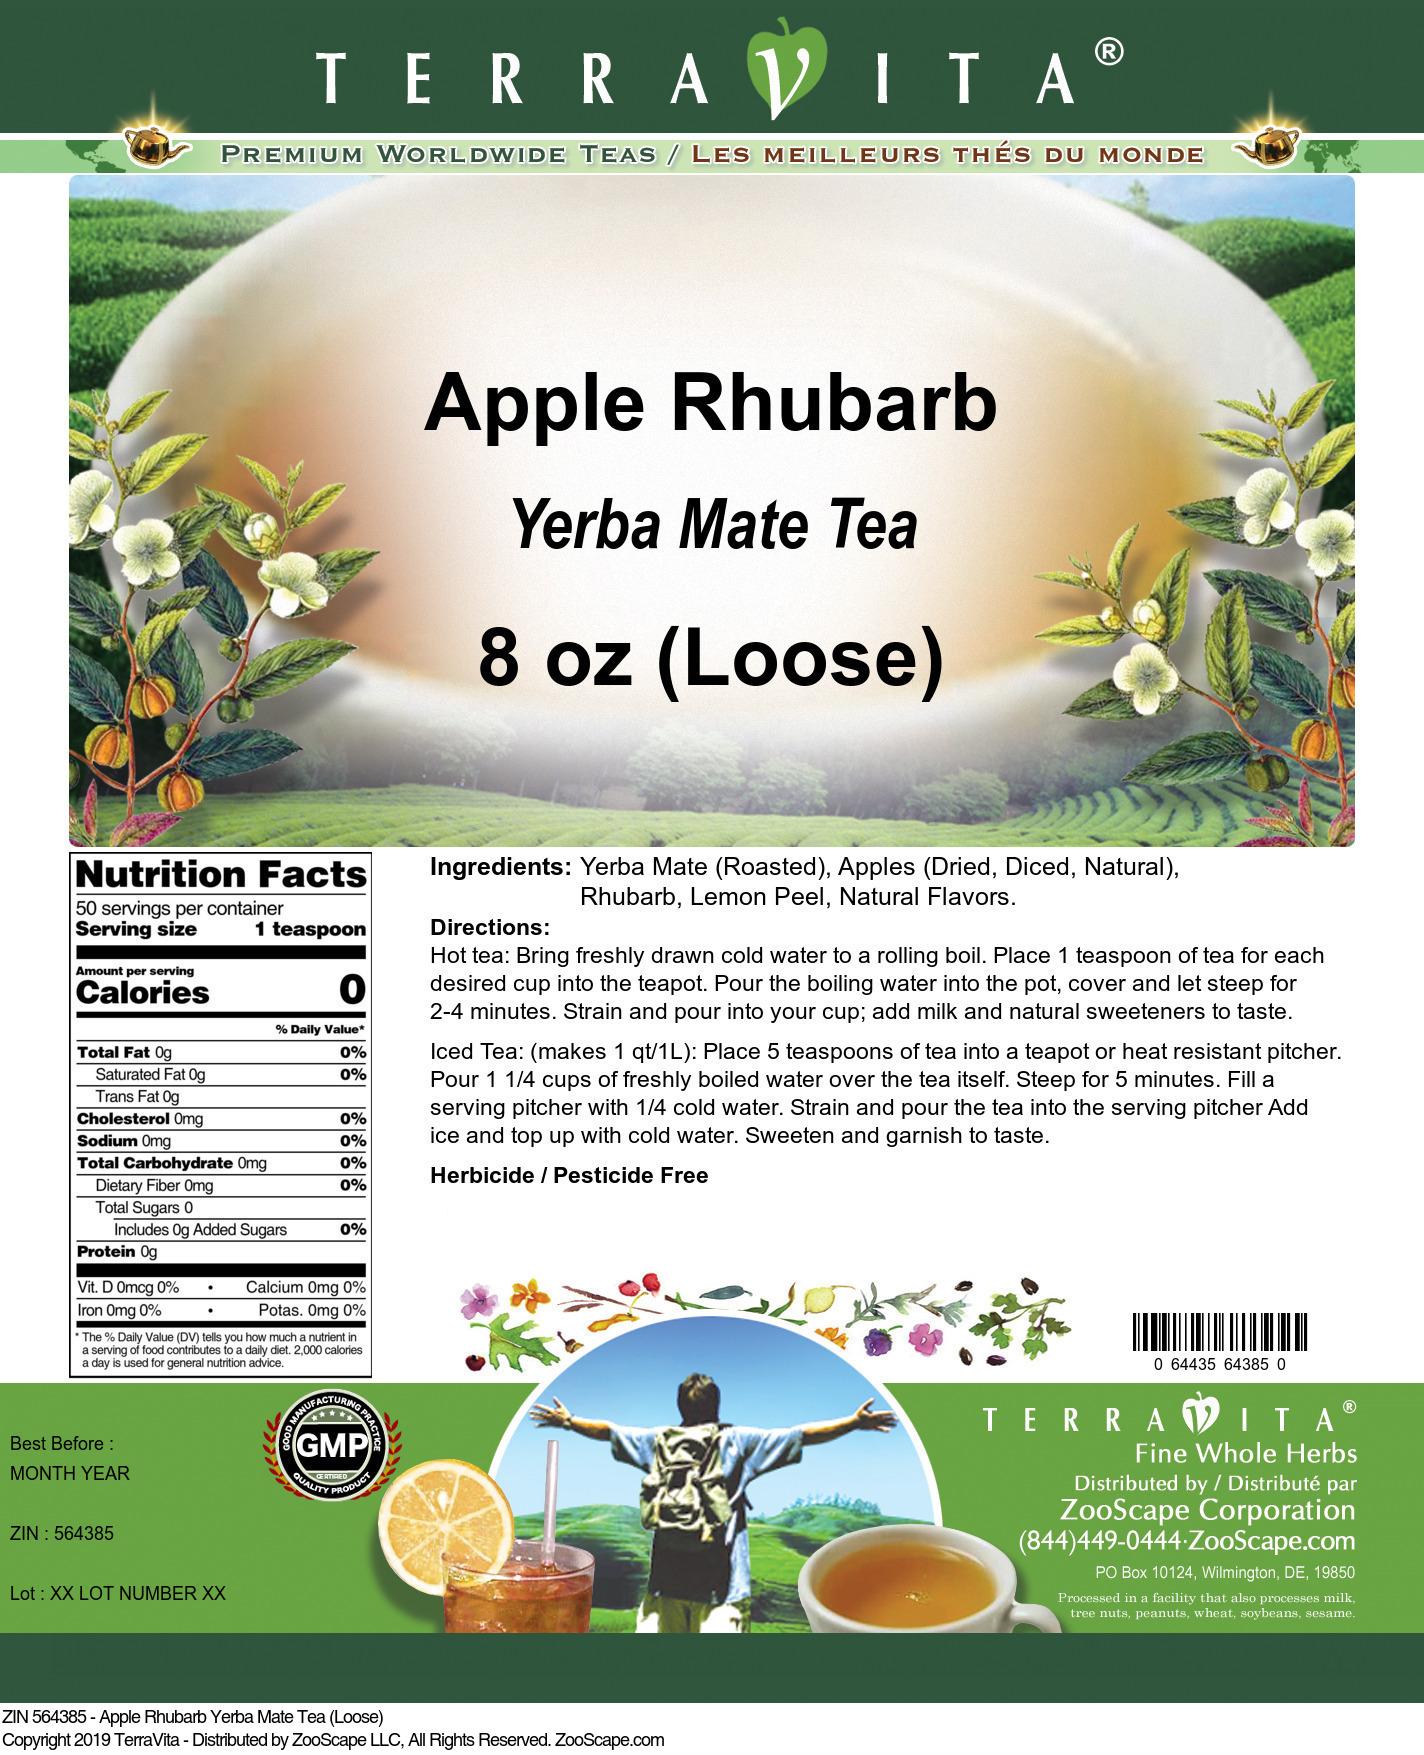 Apple Rhubarb Yerba Mate